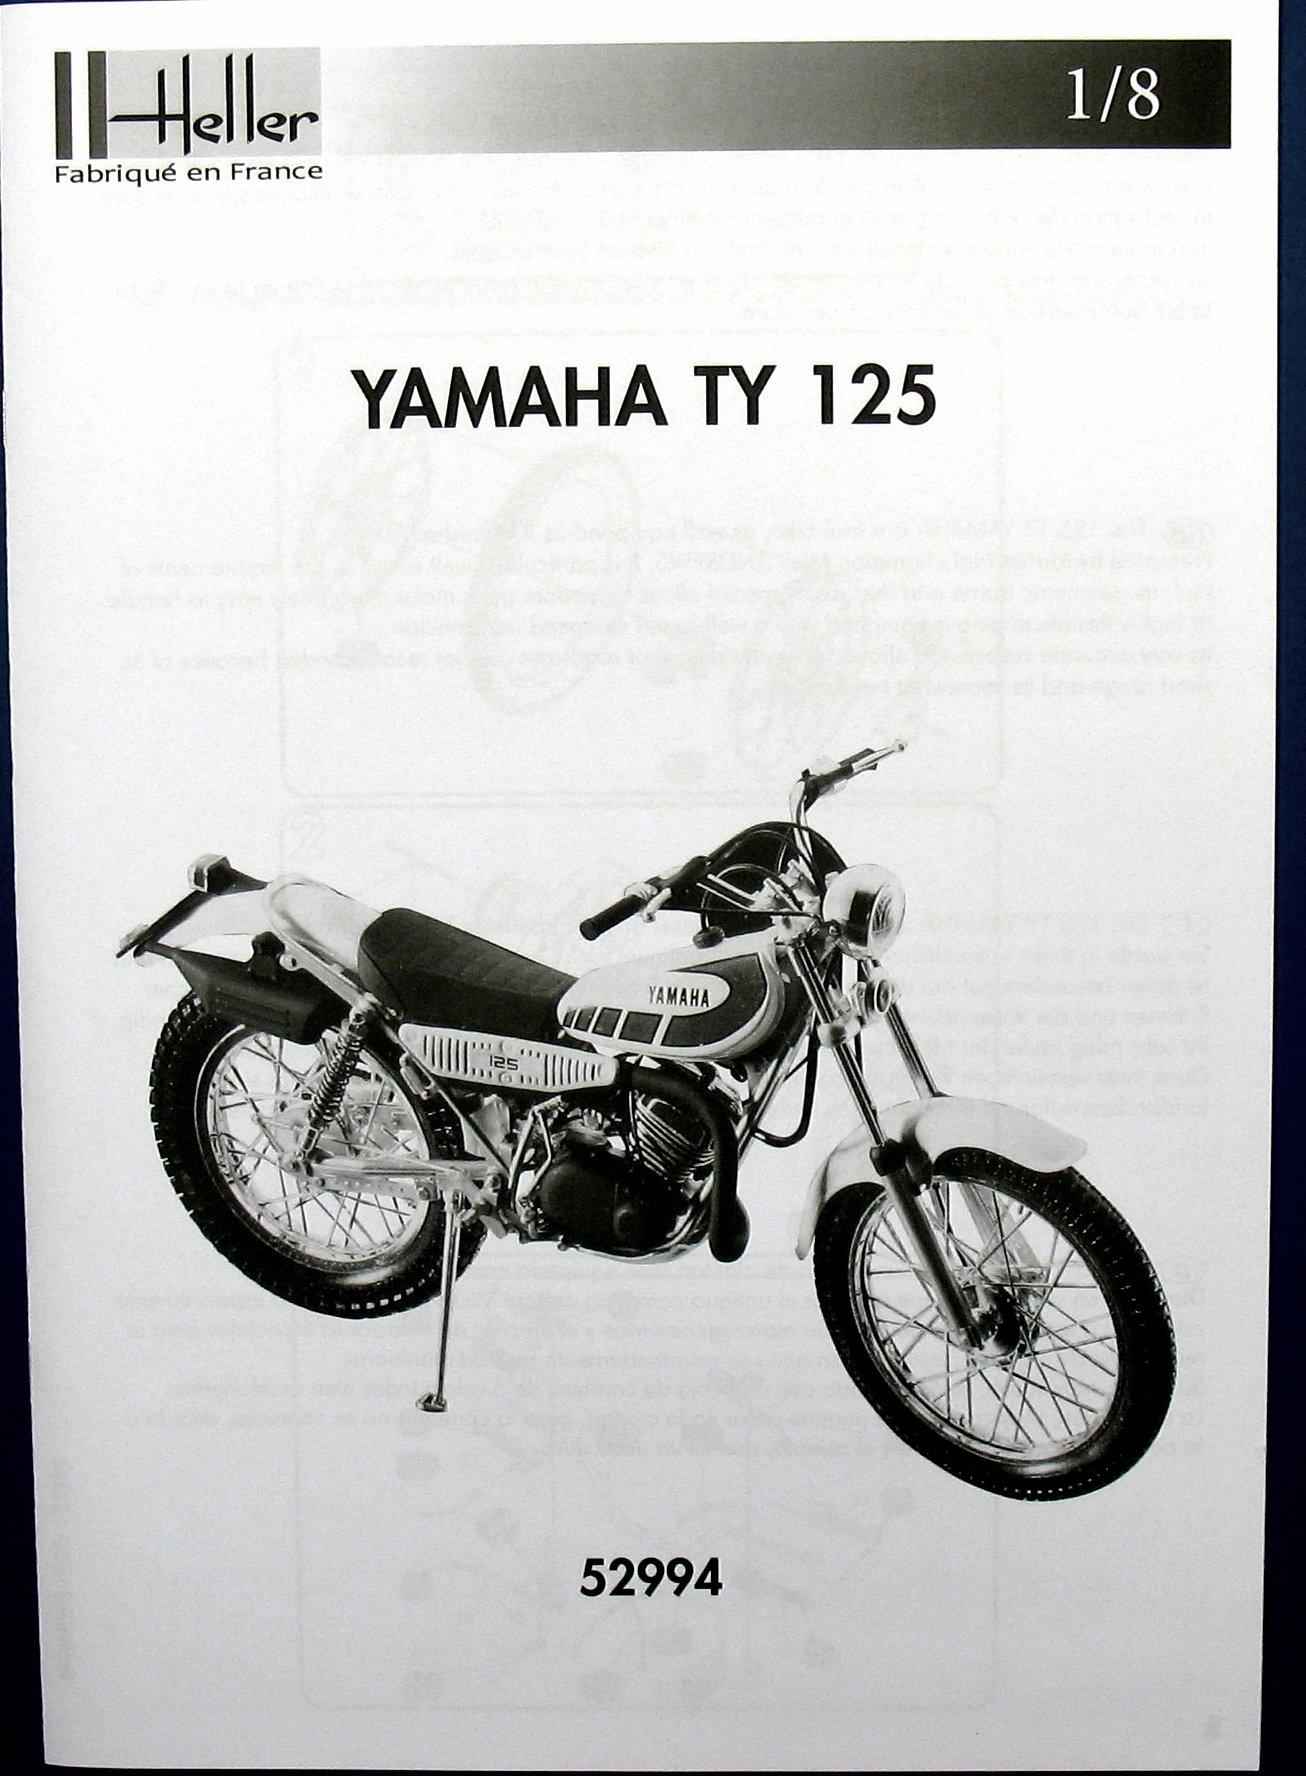 Heller 52994 Yamaha TY 125 in 1:8